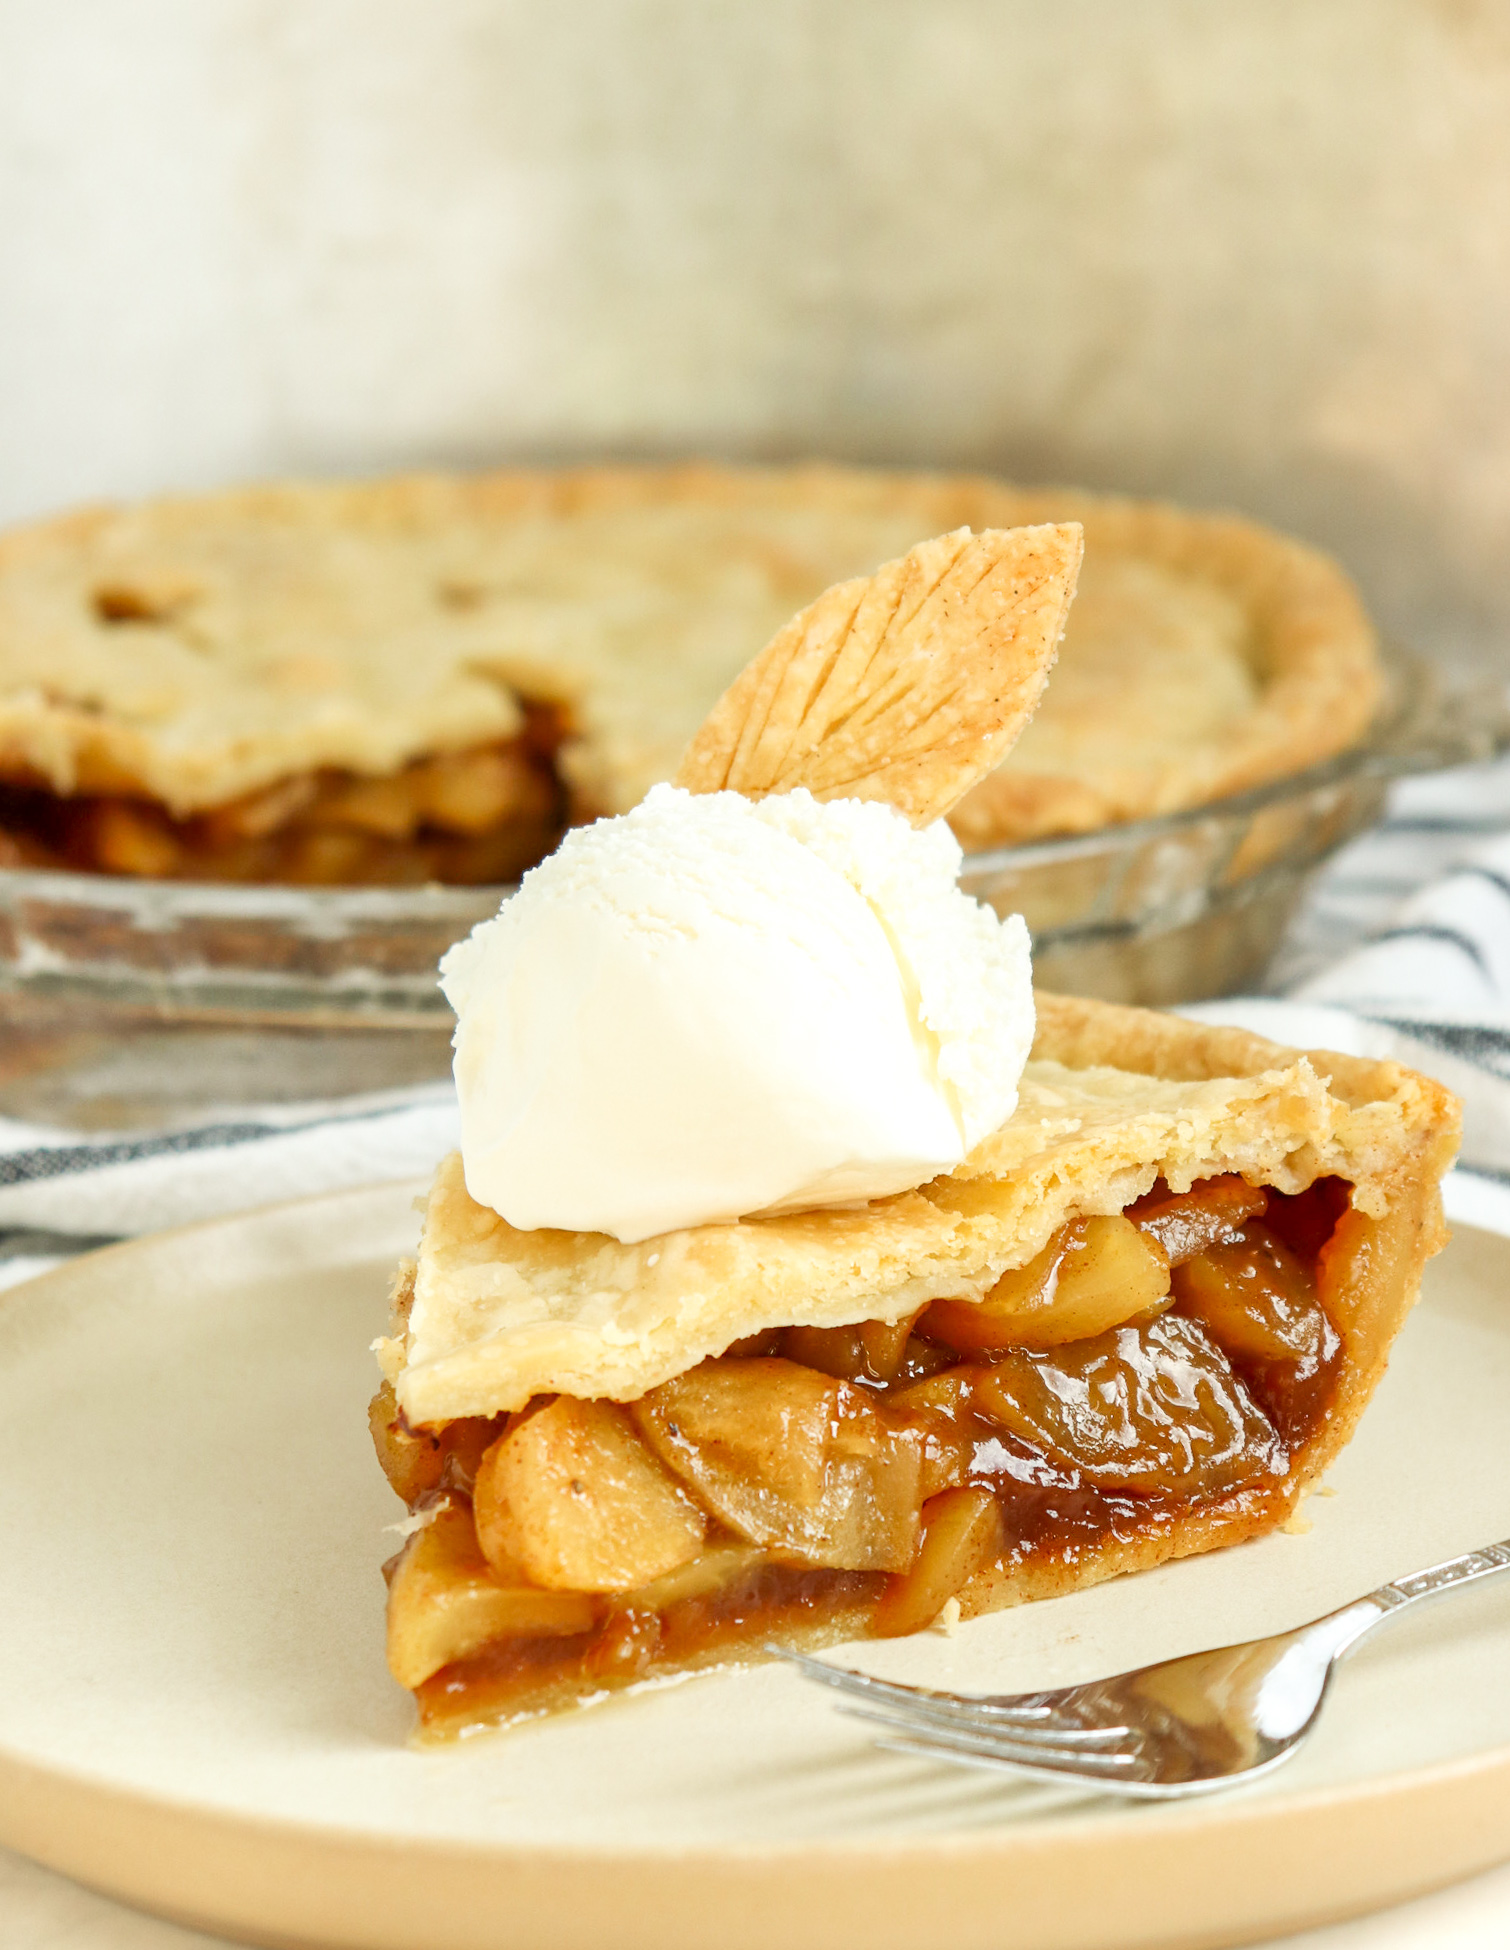 slice of apple pie with vanilla ice cream on top